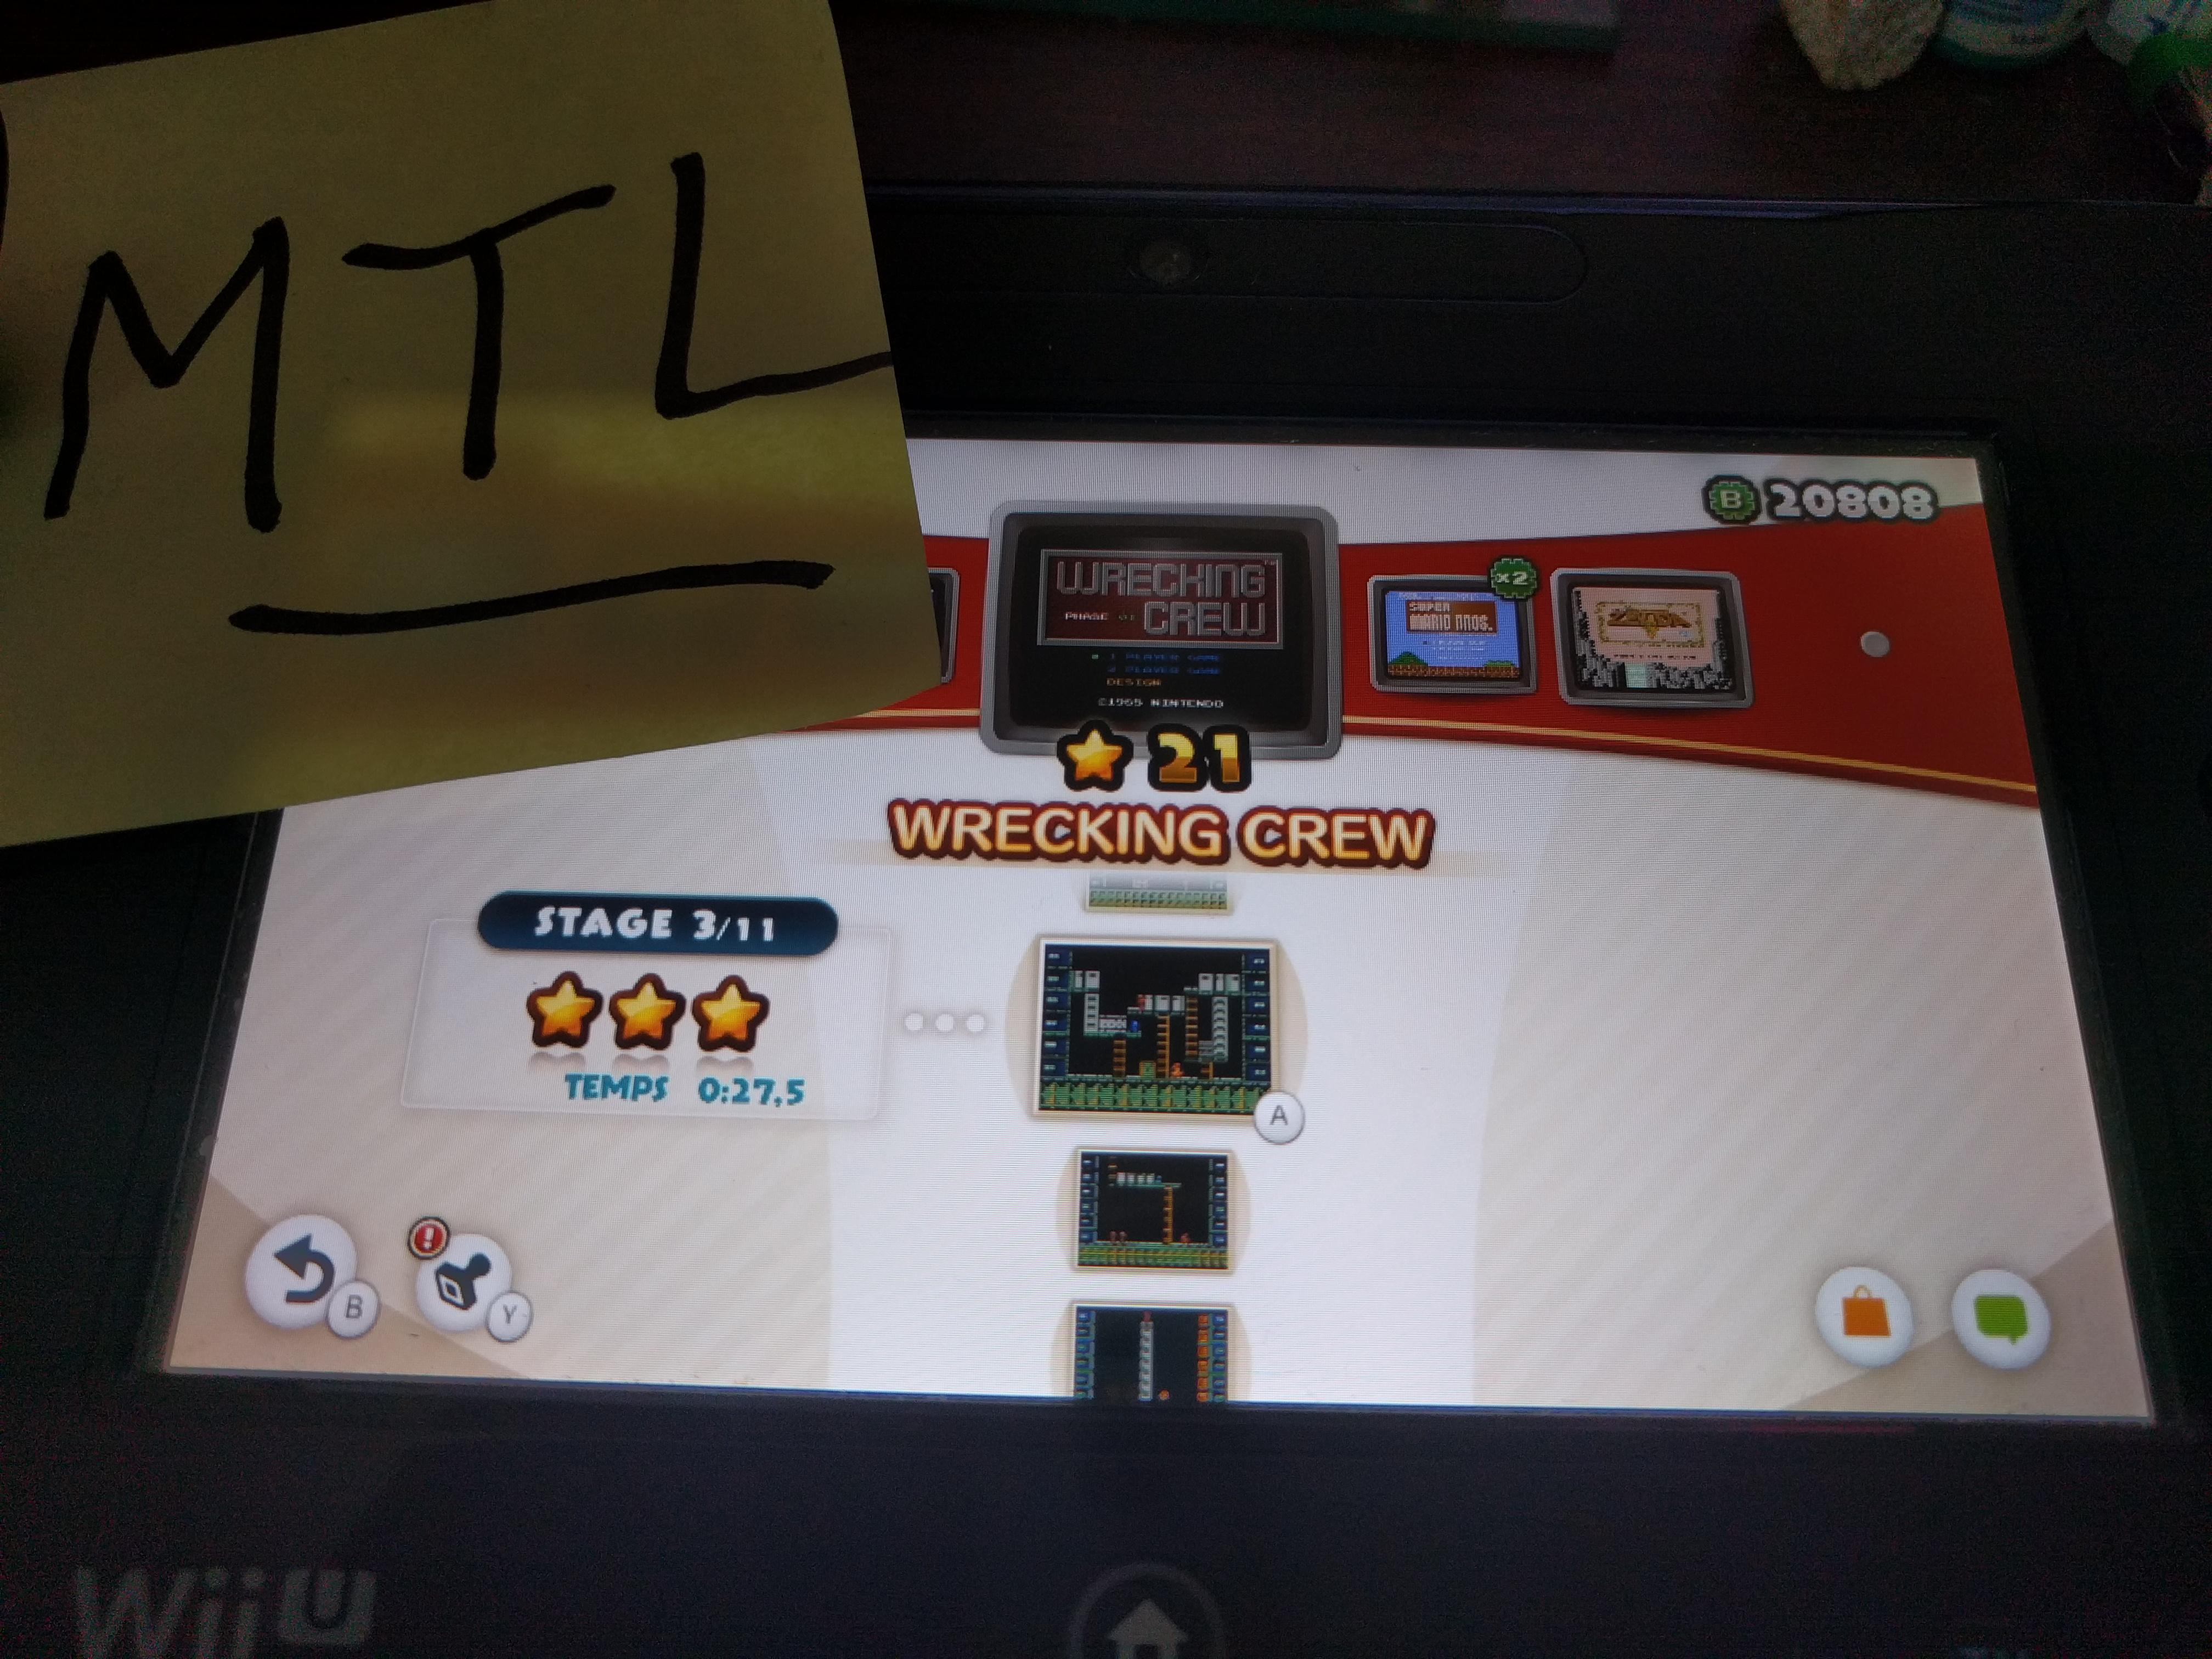 Mantalow: NES Remix: Wrecking Crew: Stage 3 (Wii U) 0:00:27.5 points on 2016-06-11 03:08:21